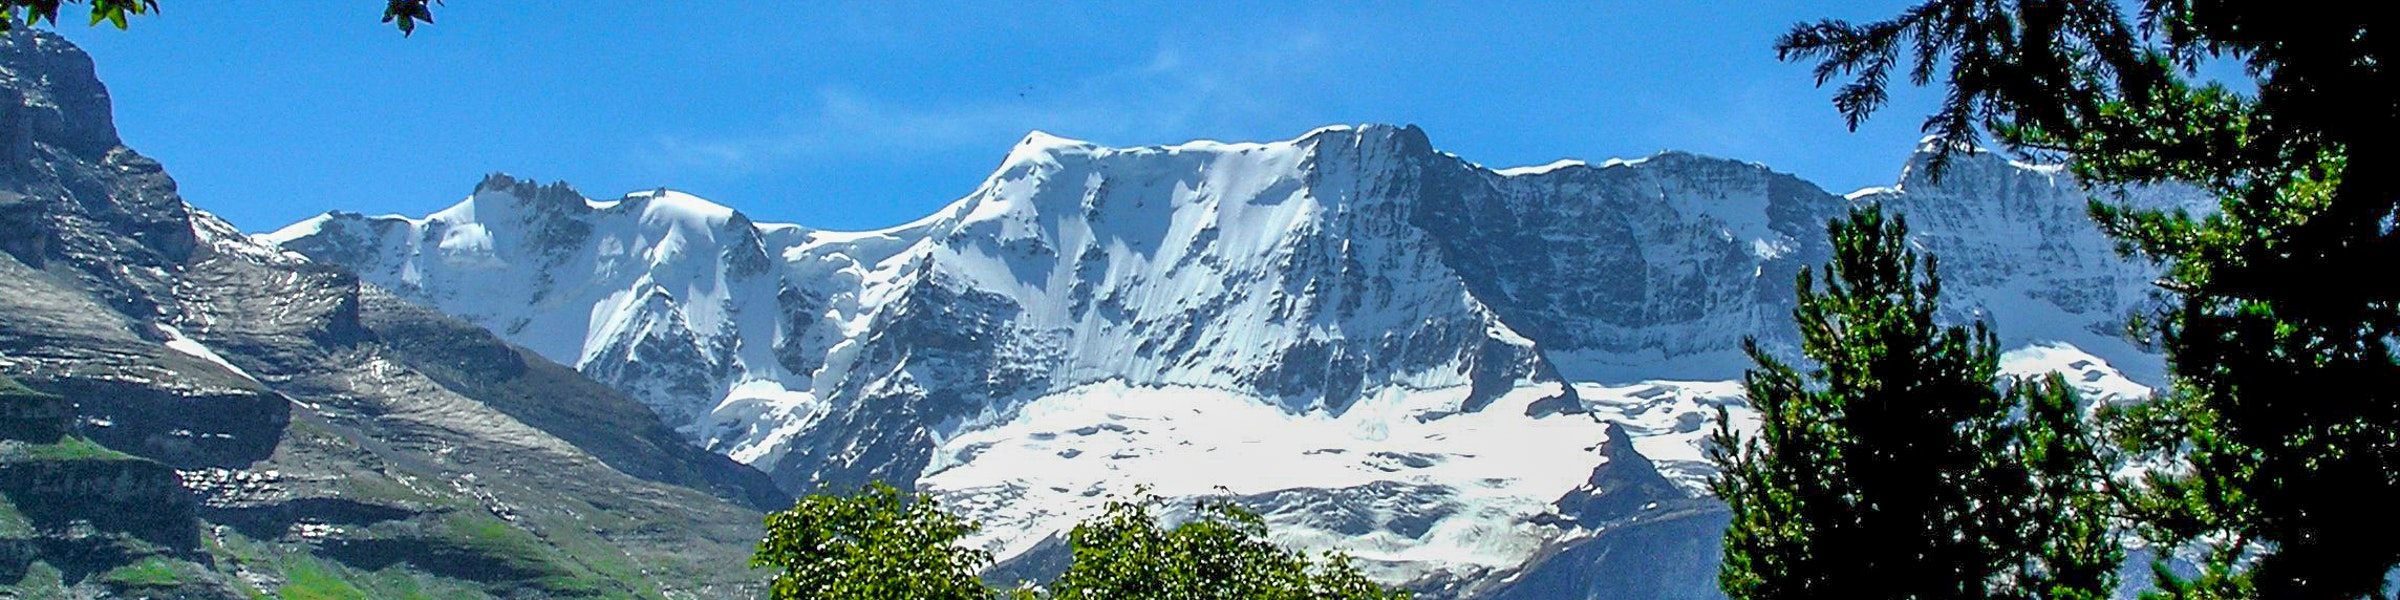 View from Mürren